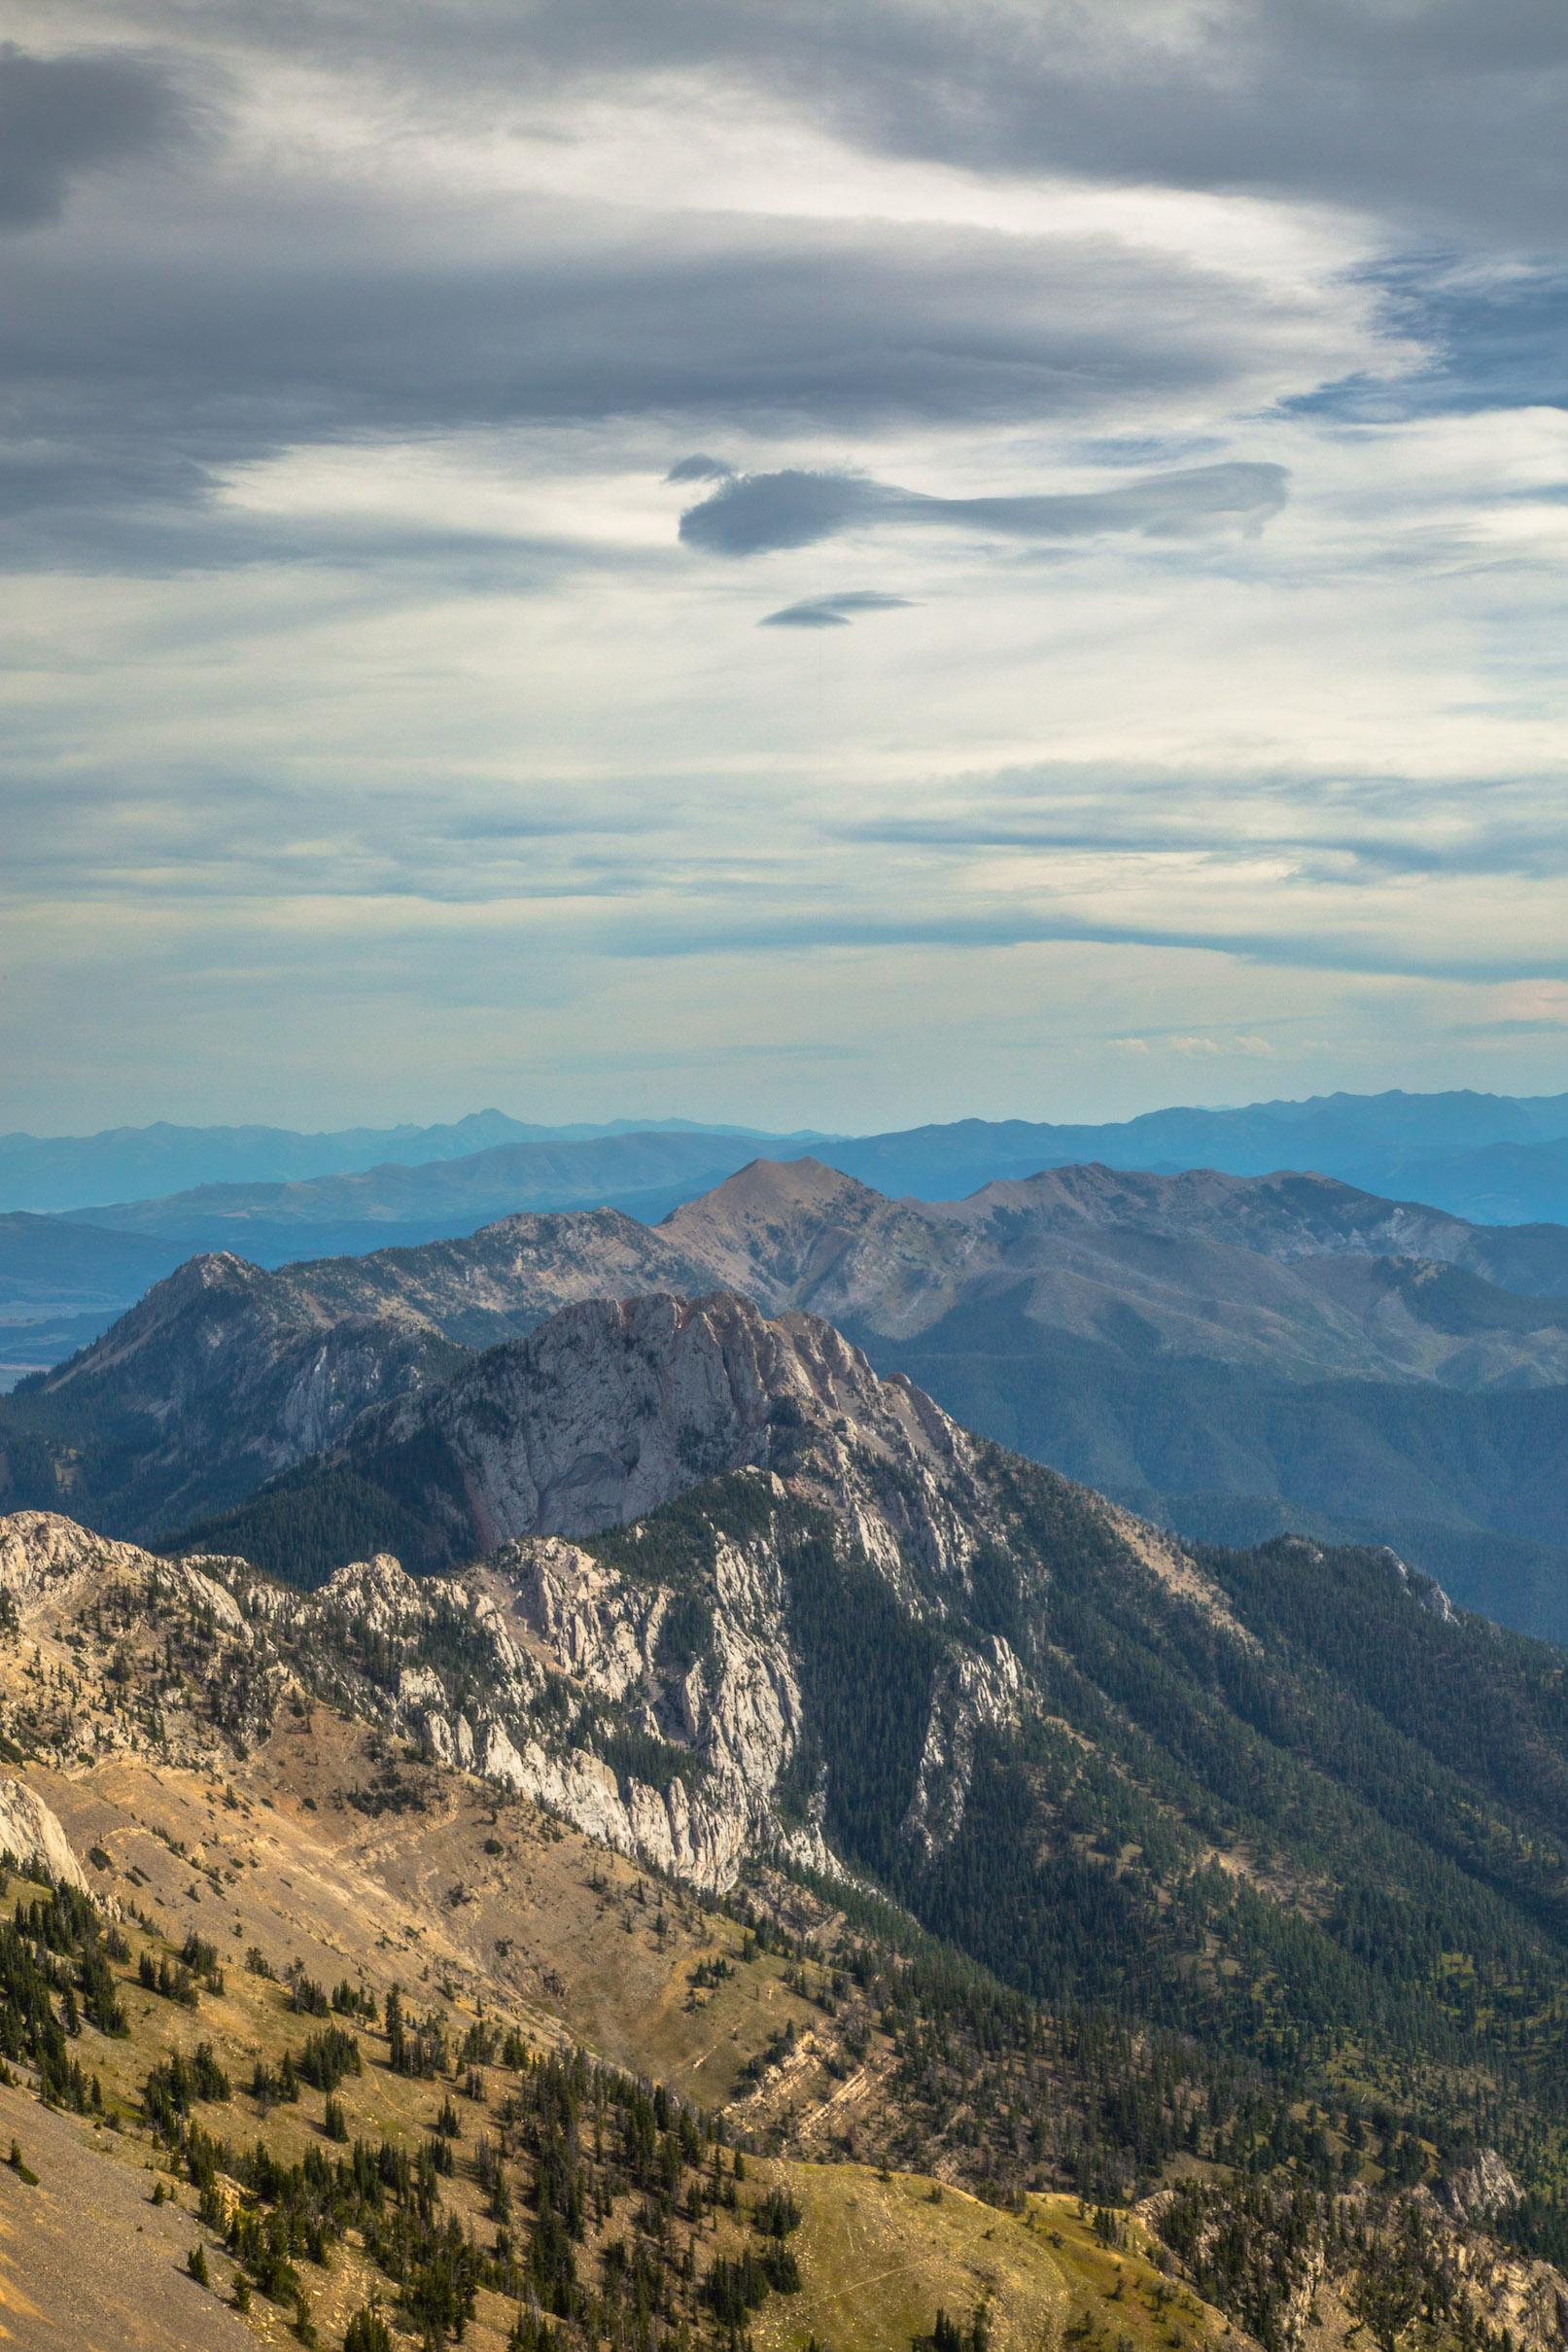 Atop Sacagawea Peak in the Bridger Mountain Range